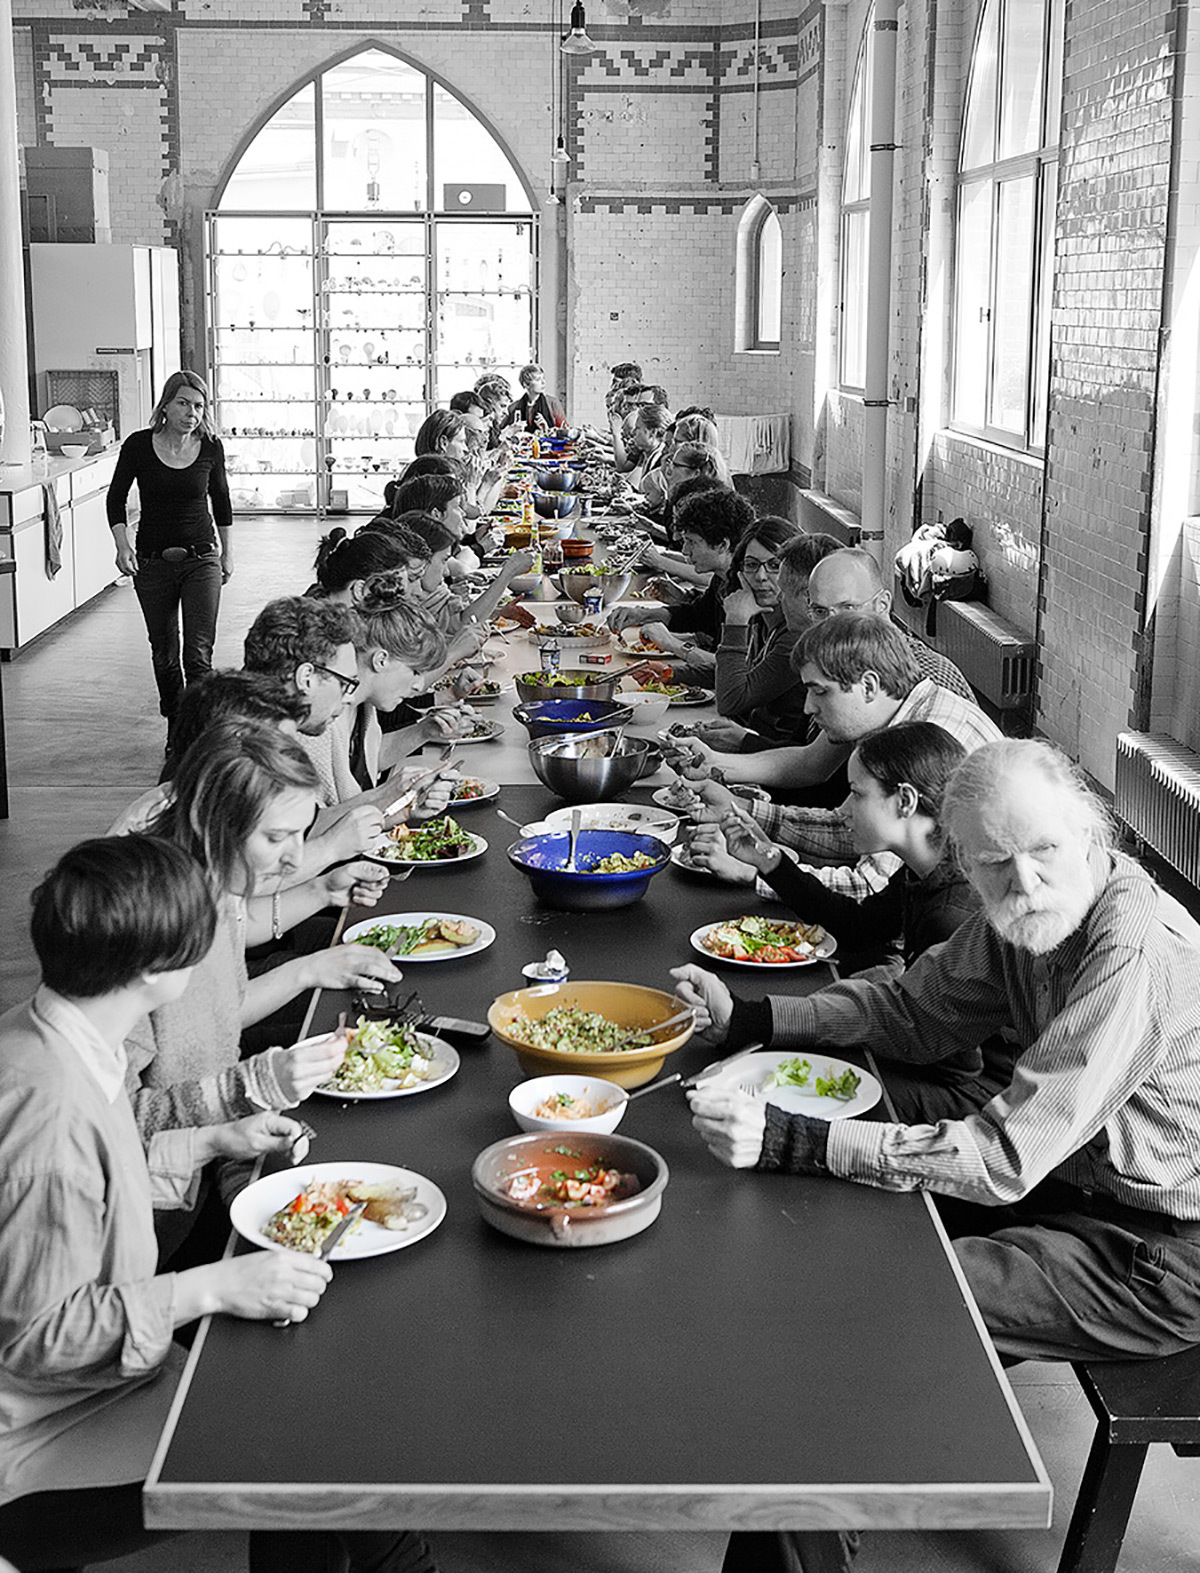 Déjeuner au Studio Olafur Eliasson - Photo Maria del Pilar García Ayensa © Studio Olafur Eliasson (page 36)